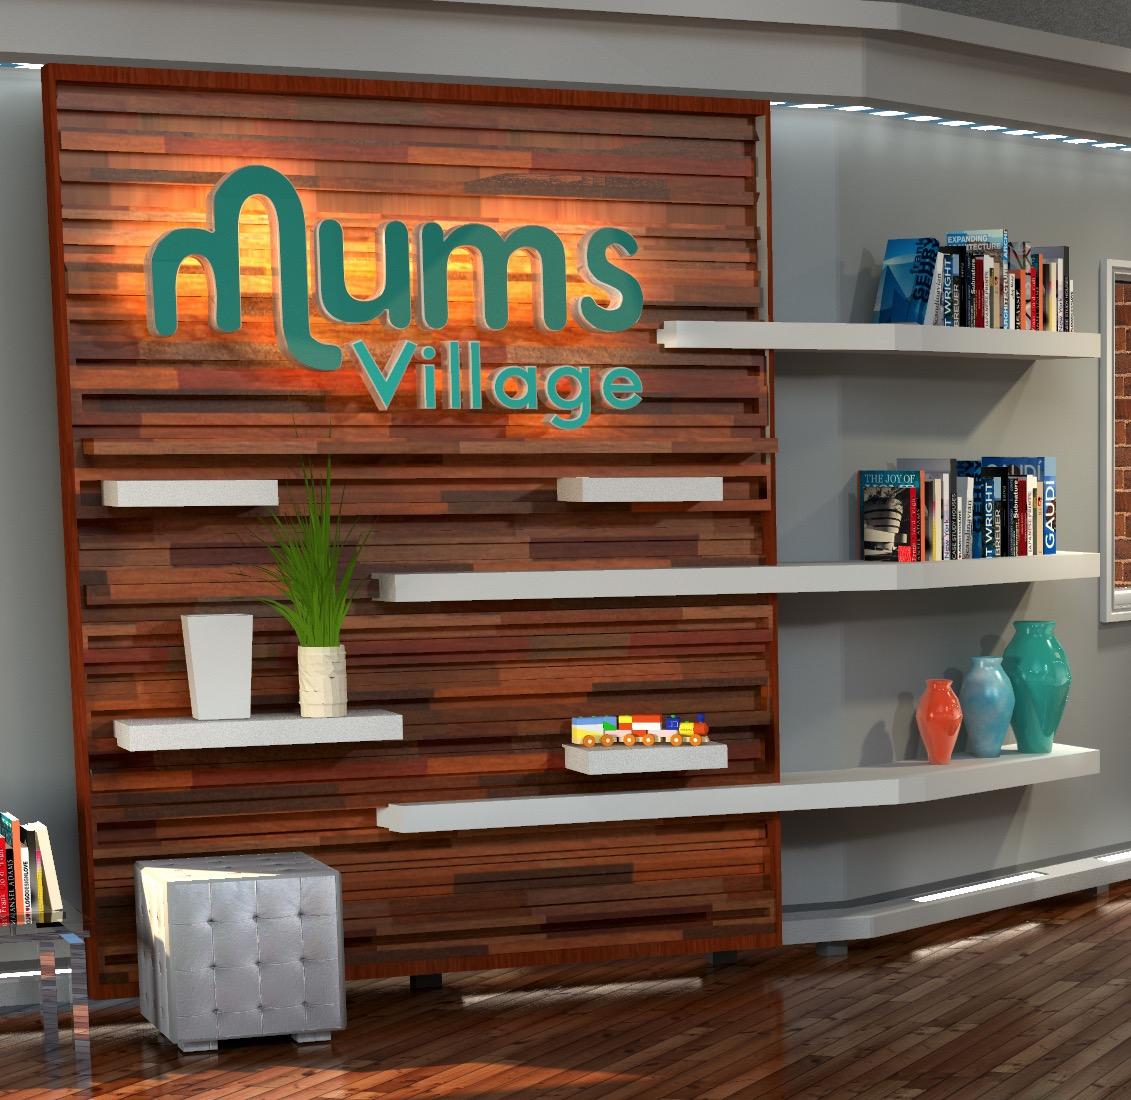 17 - Mums-logo-set piece